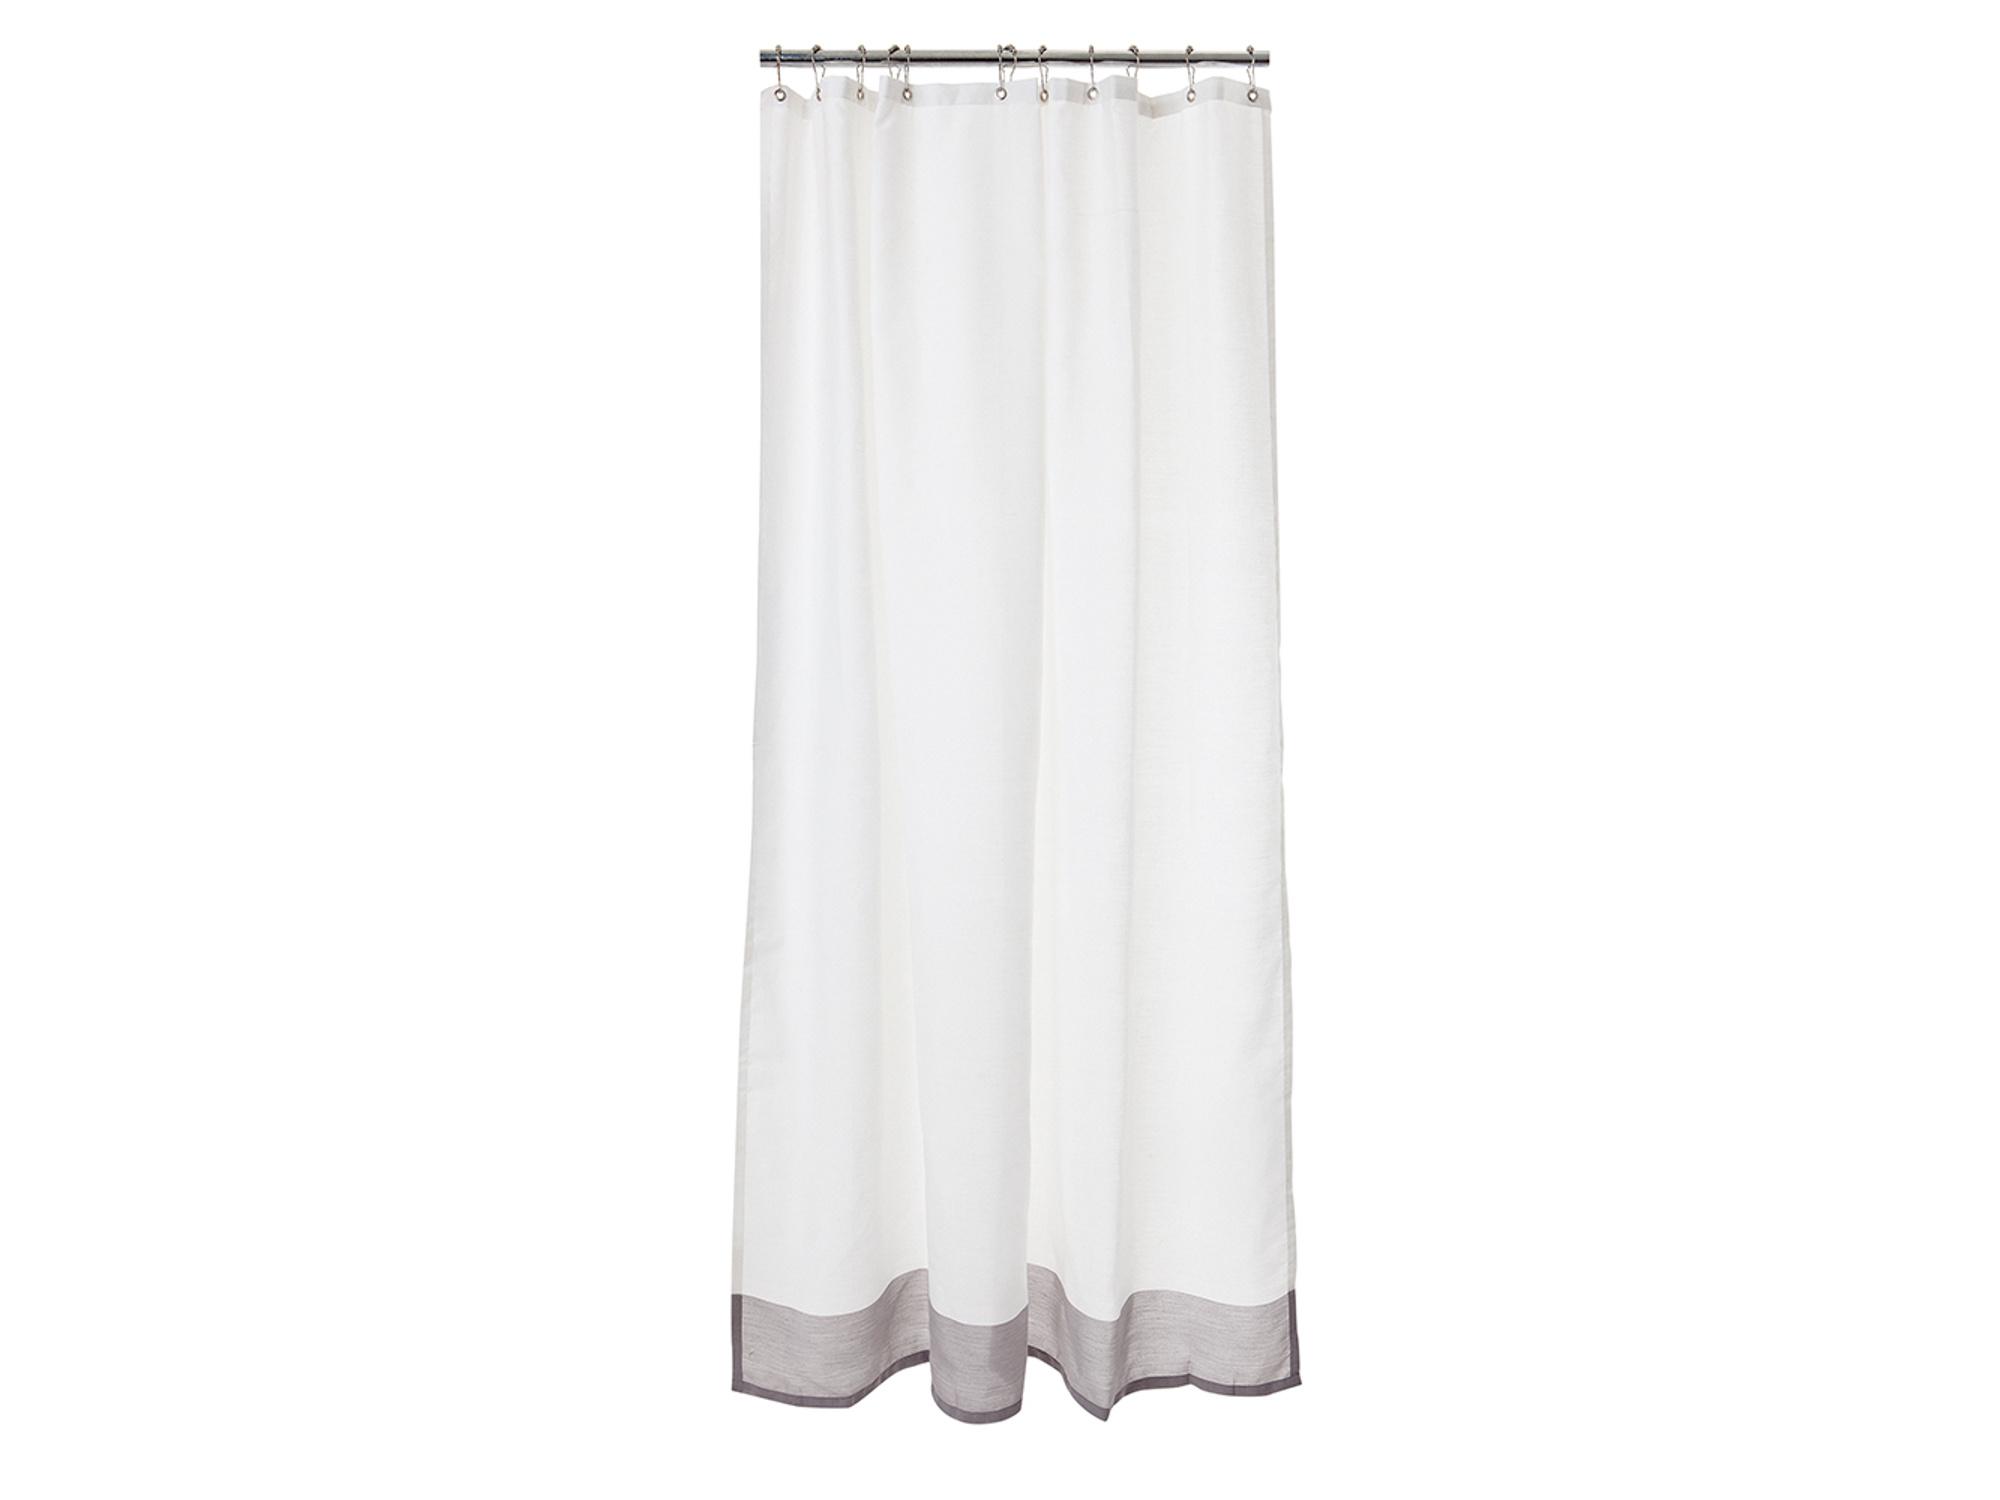 Shower Curtain, White/Gray